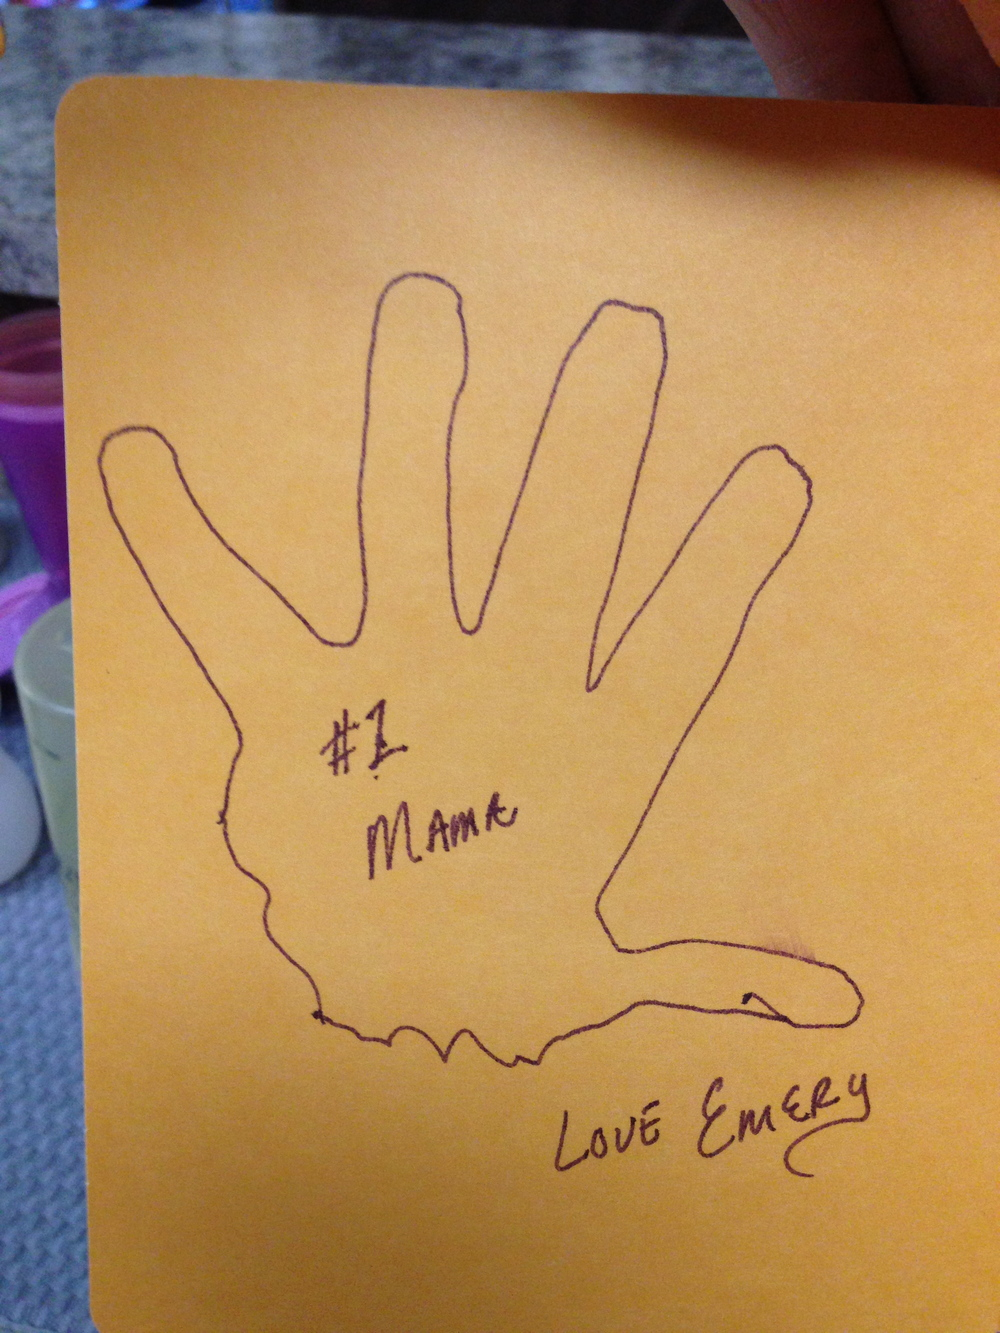 Emmy's signature.